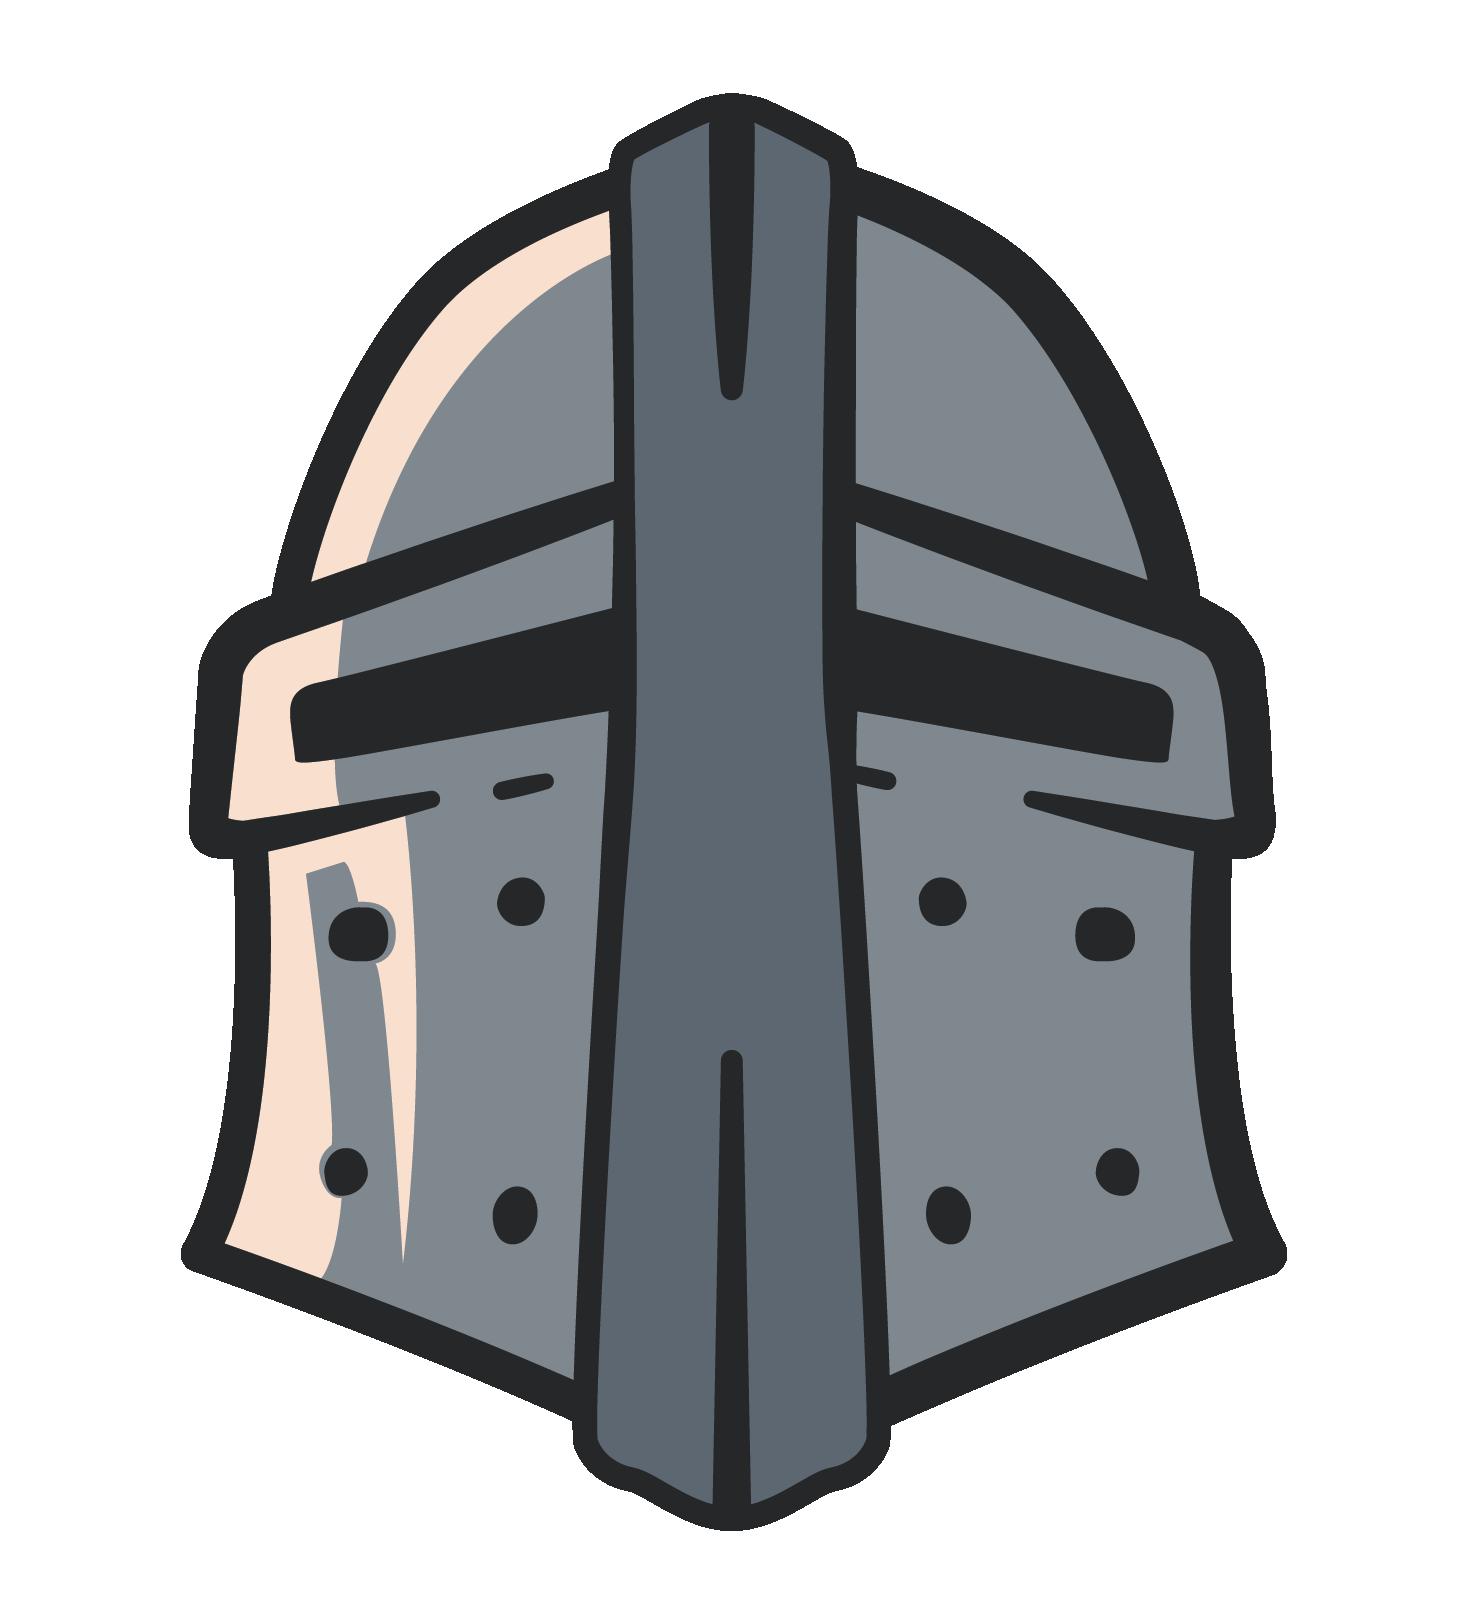 Knight helmet png. Kortnee kate photography